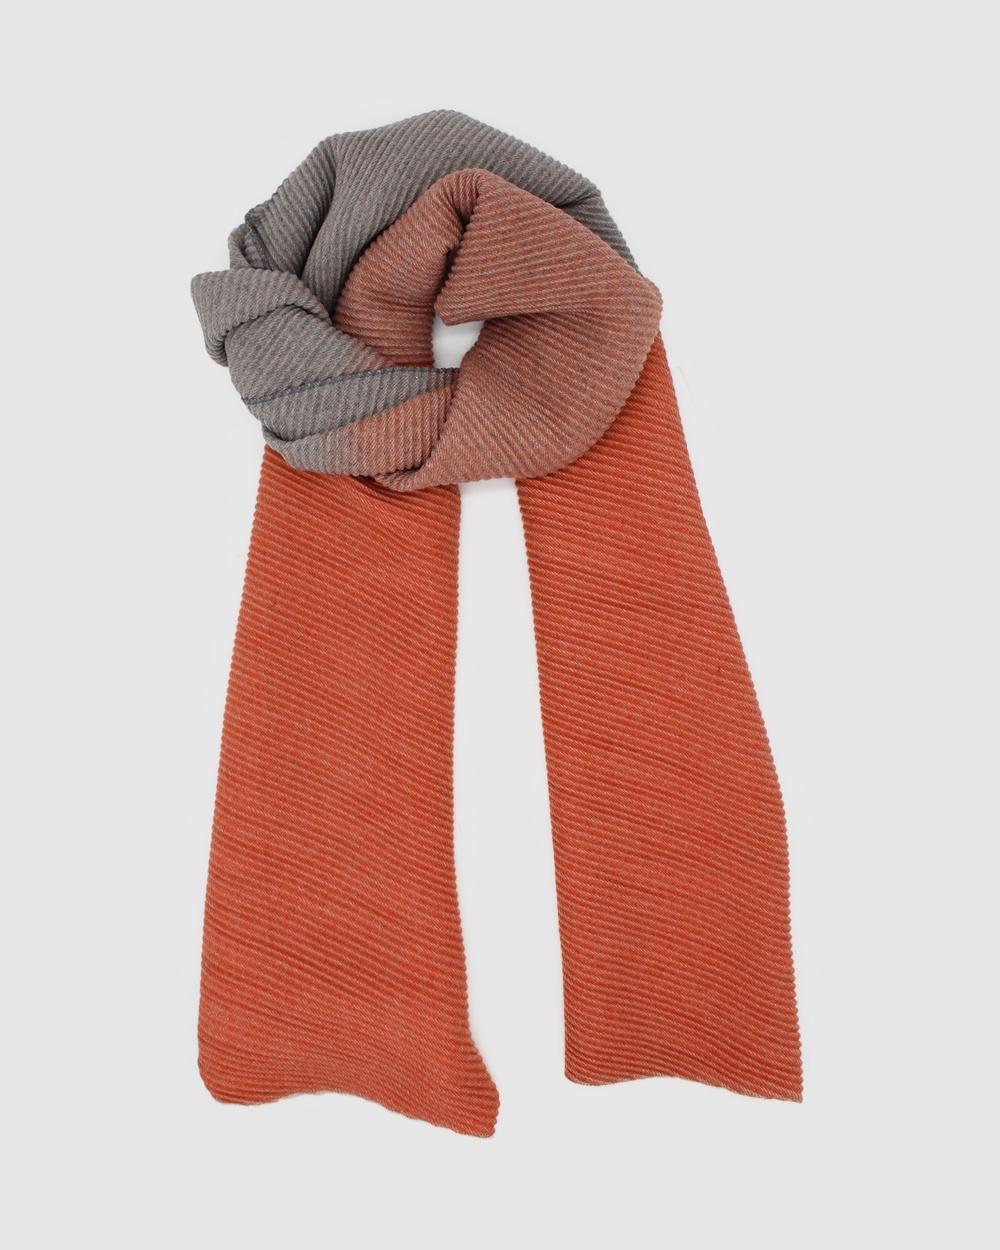 Morgan & Taylor Tina Scarf Scarves Gloves Orange